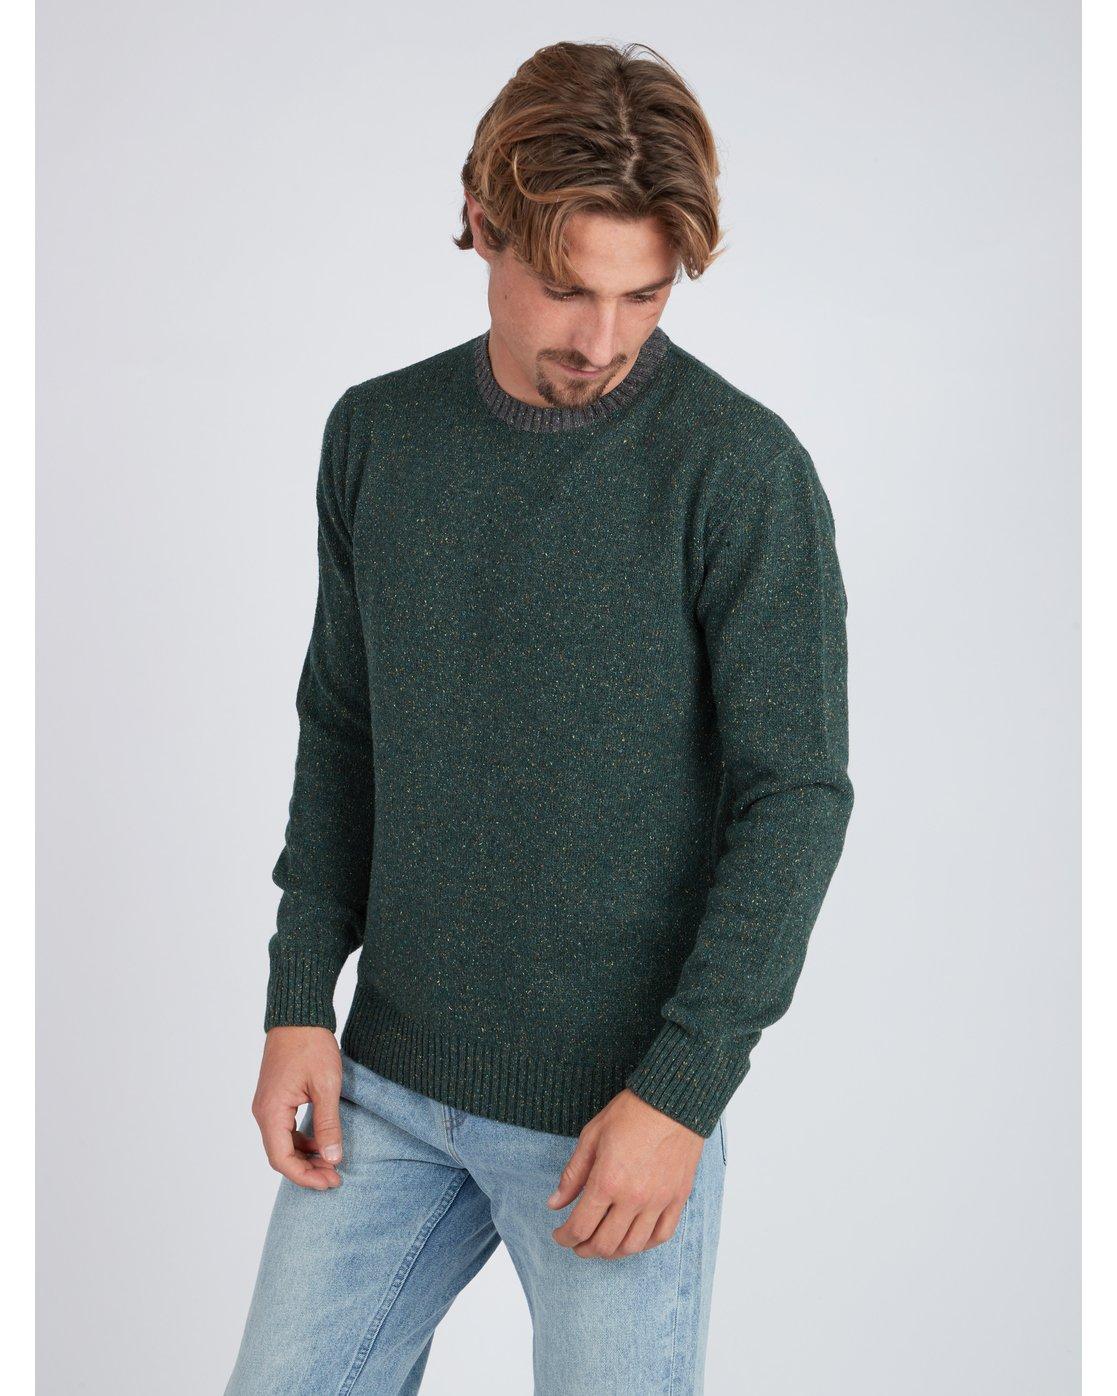 Oceanside Recycled Yarn Sweater